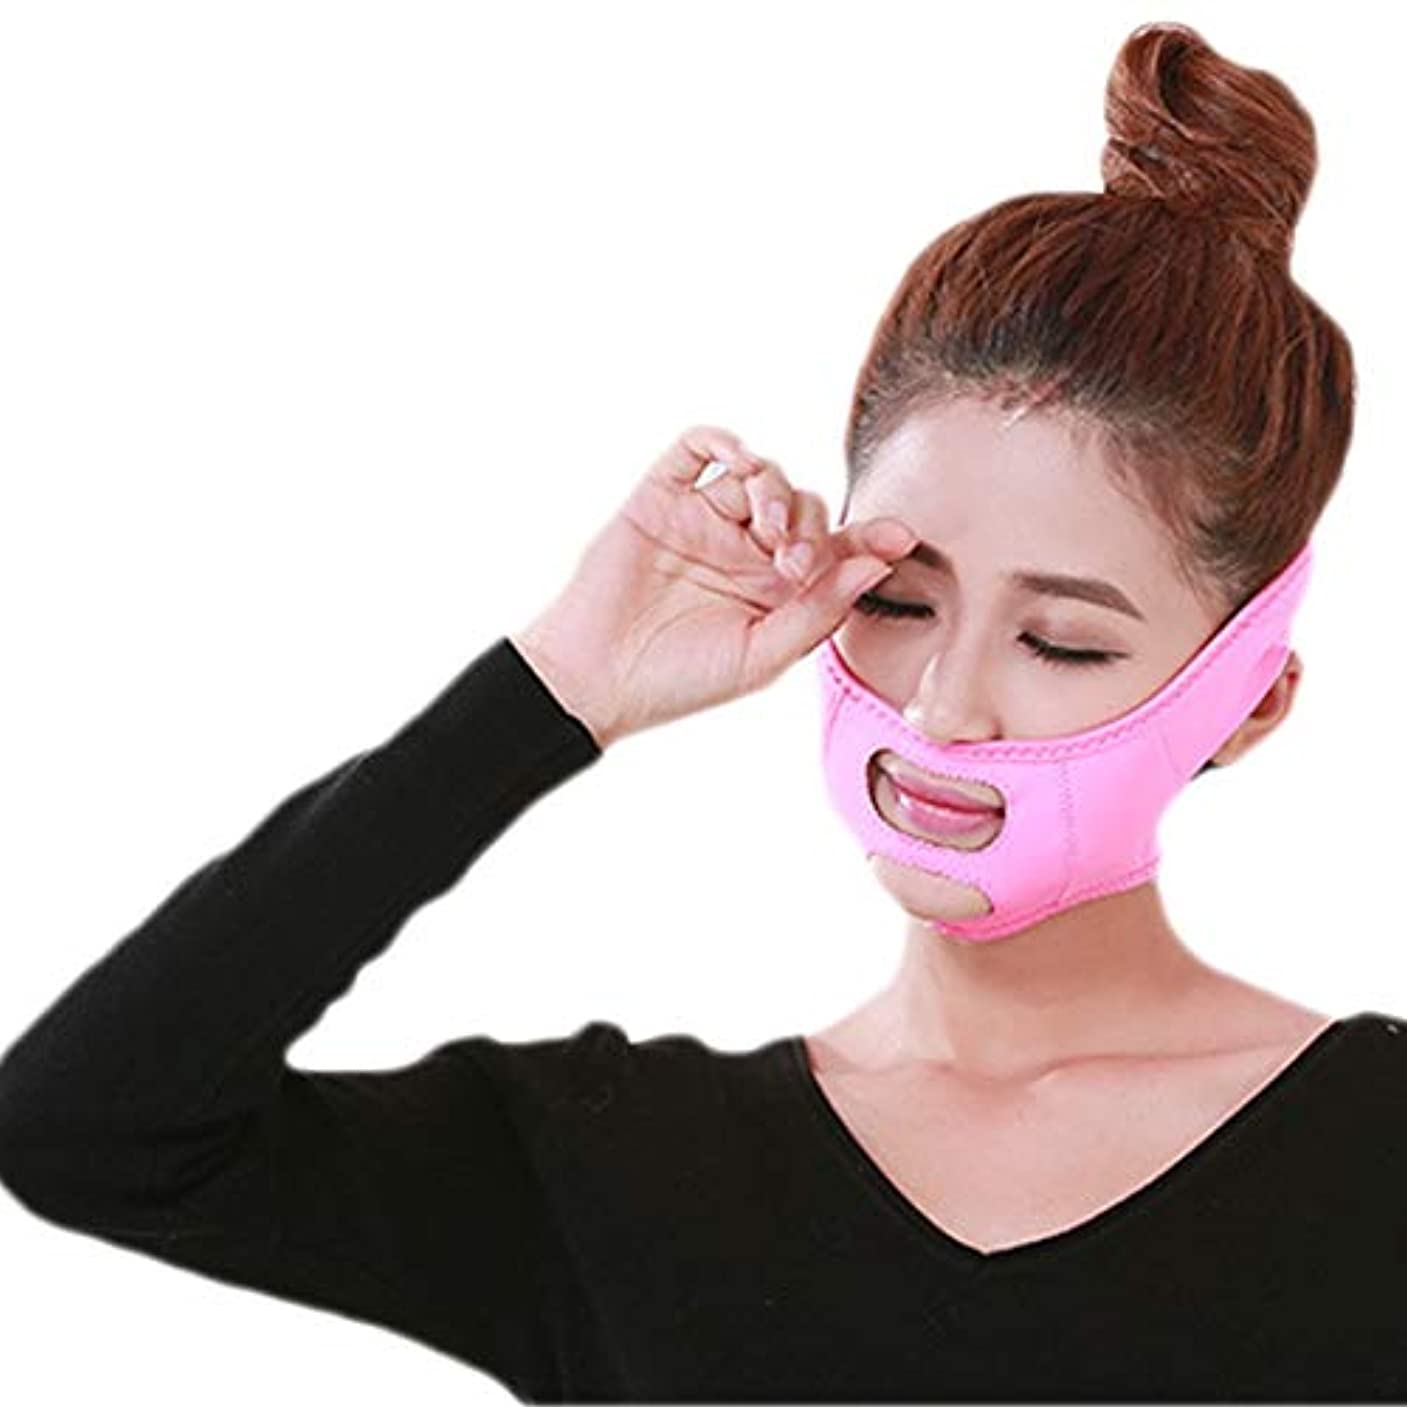 ZWBD フェイスマスク, 顔を持ち上げる包帯持ち上がるV二重あご薄い顔包帯男性と女性のしわ防止法修正パターン修正ツール (Color : Pink)